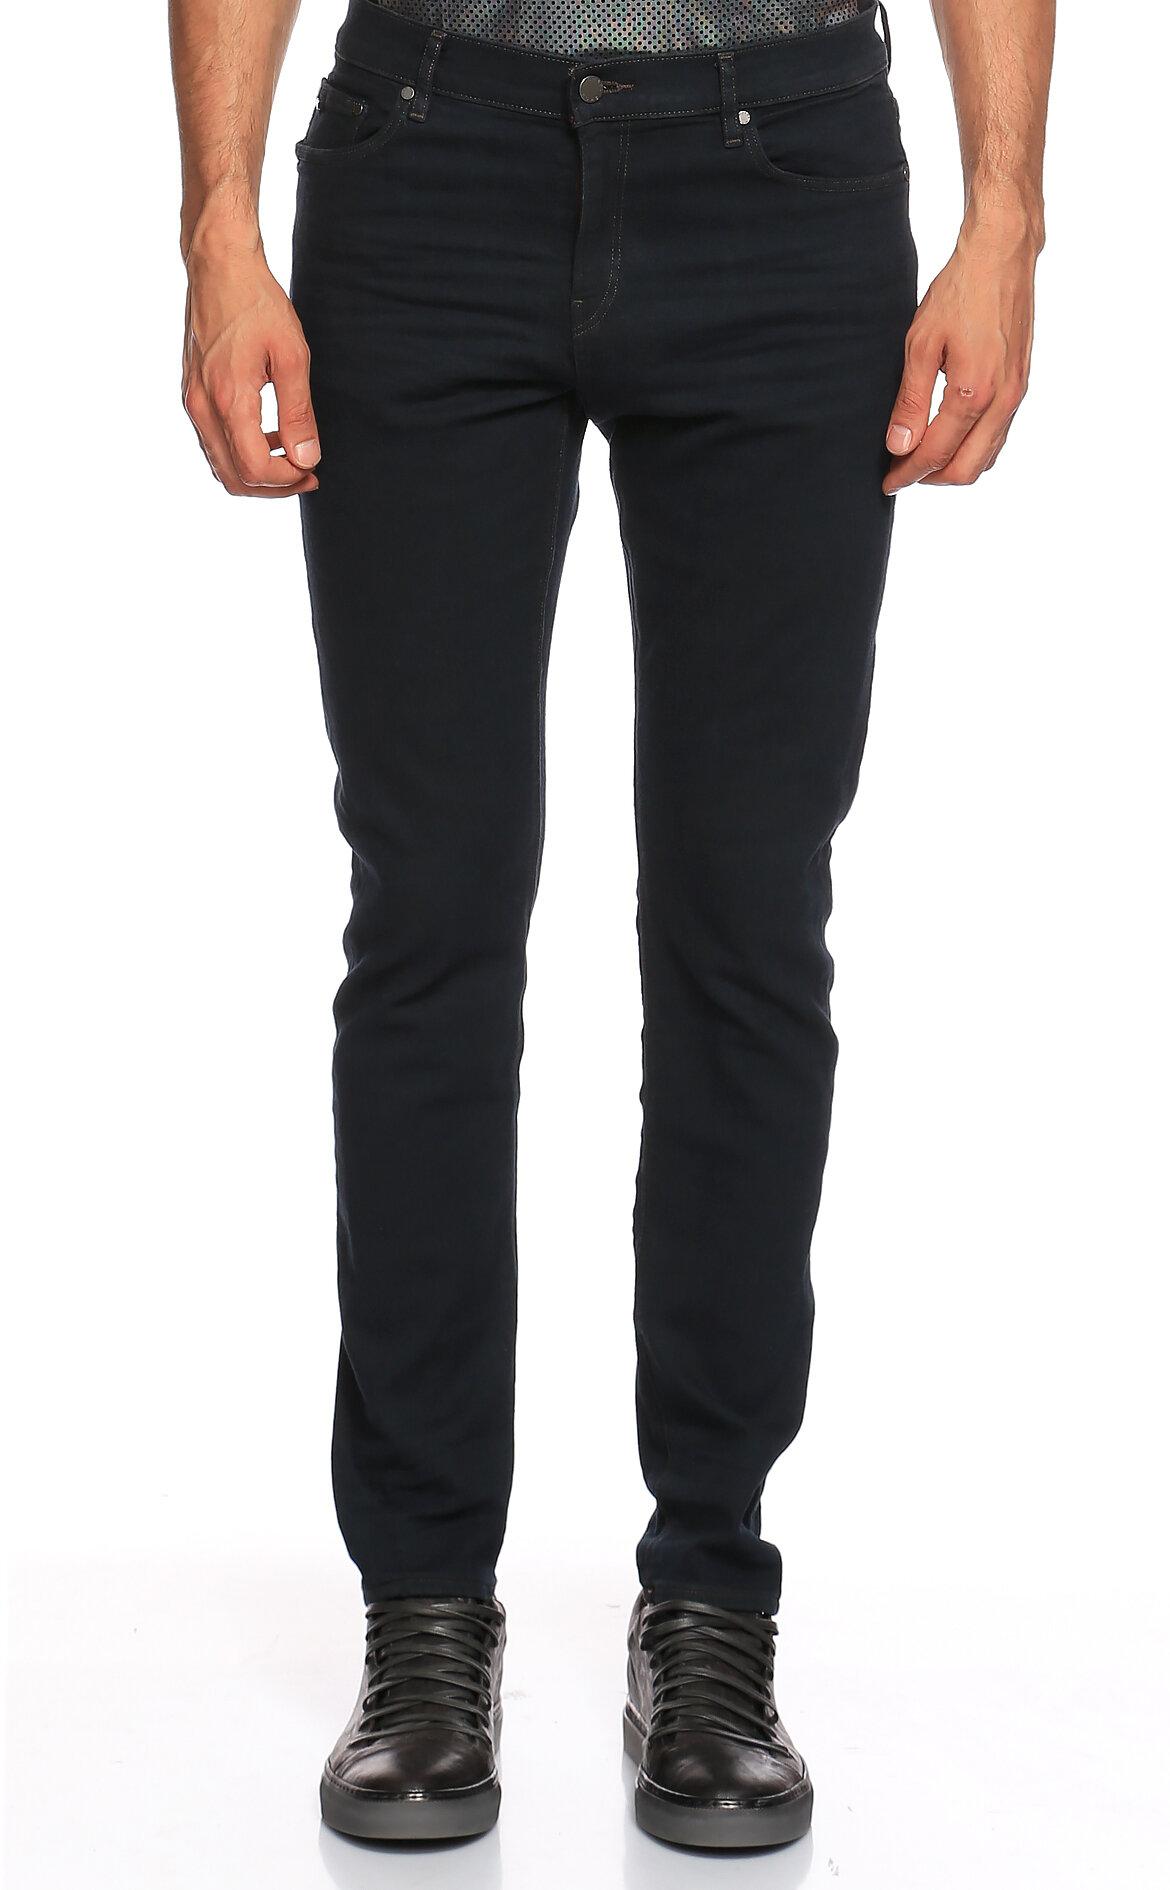 Michael Kors Collection-Michael Kors Collection Denim Pantolon